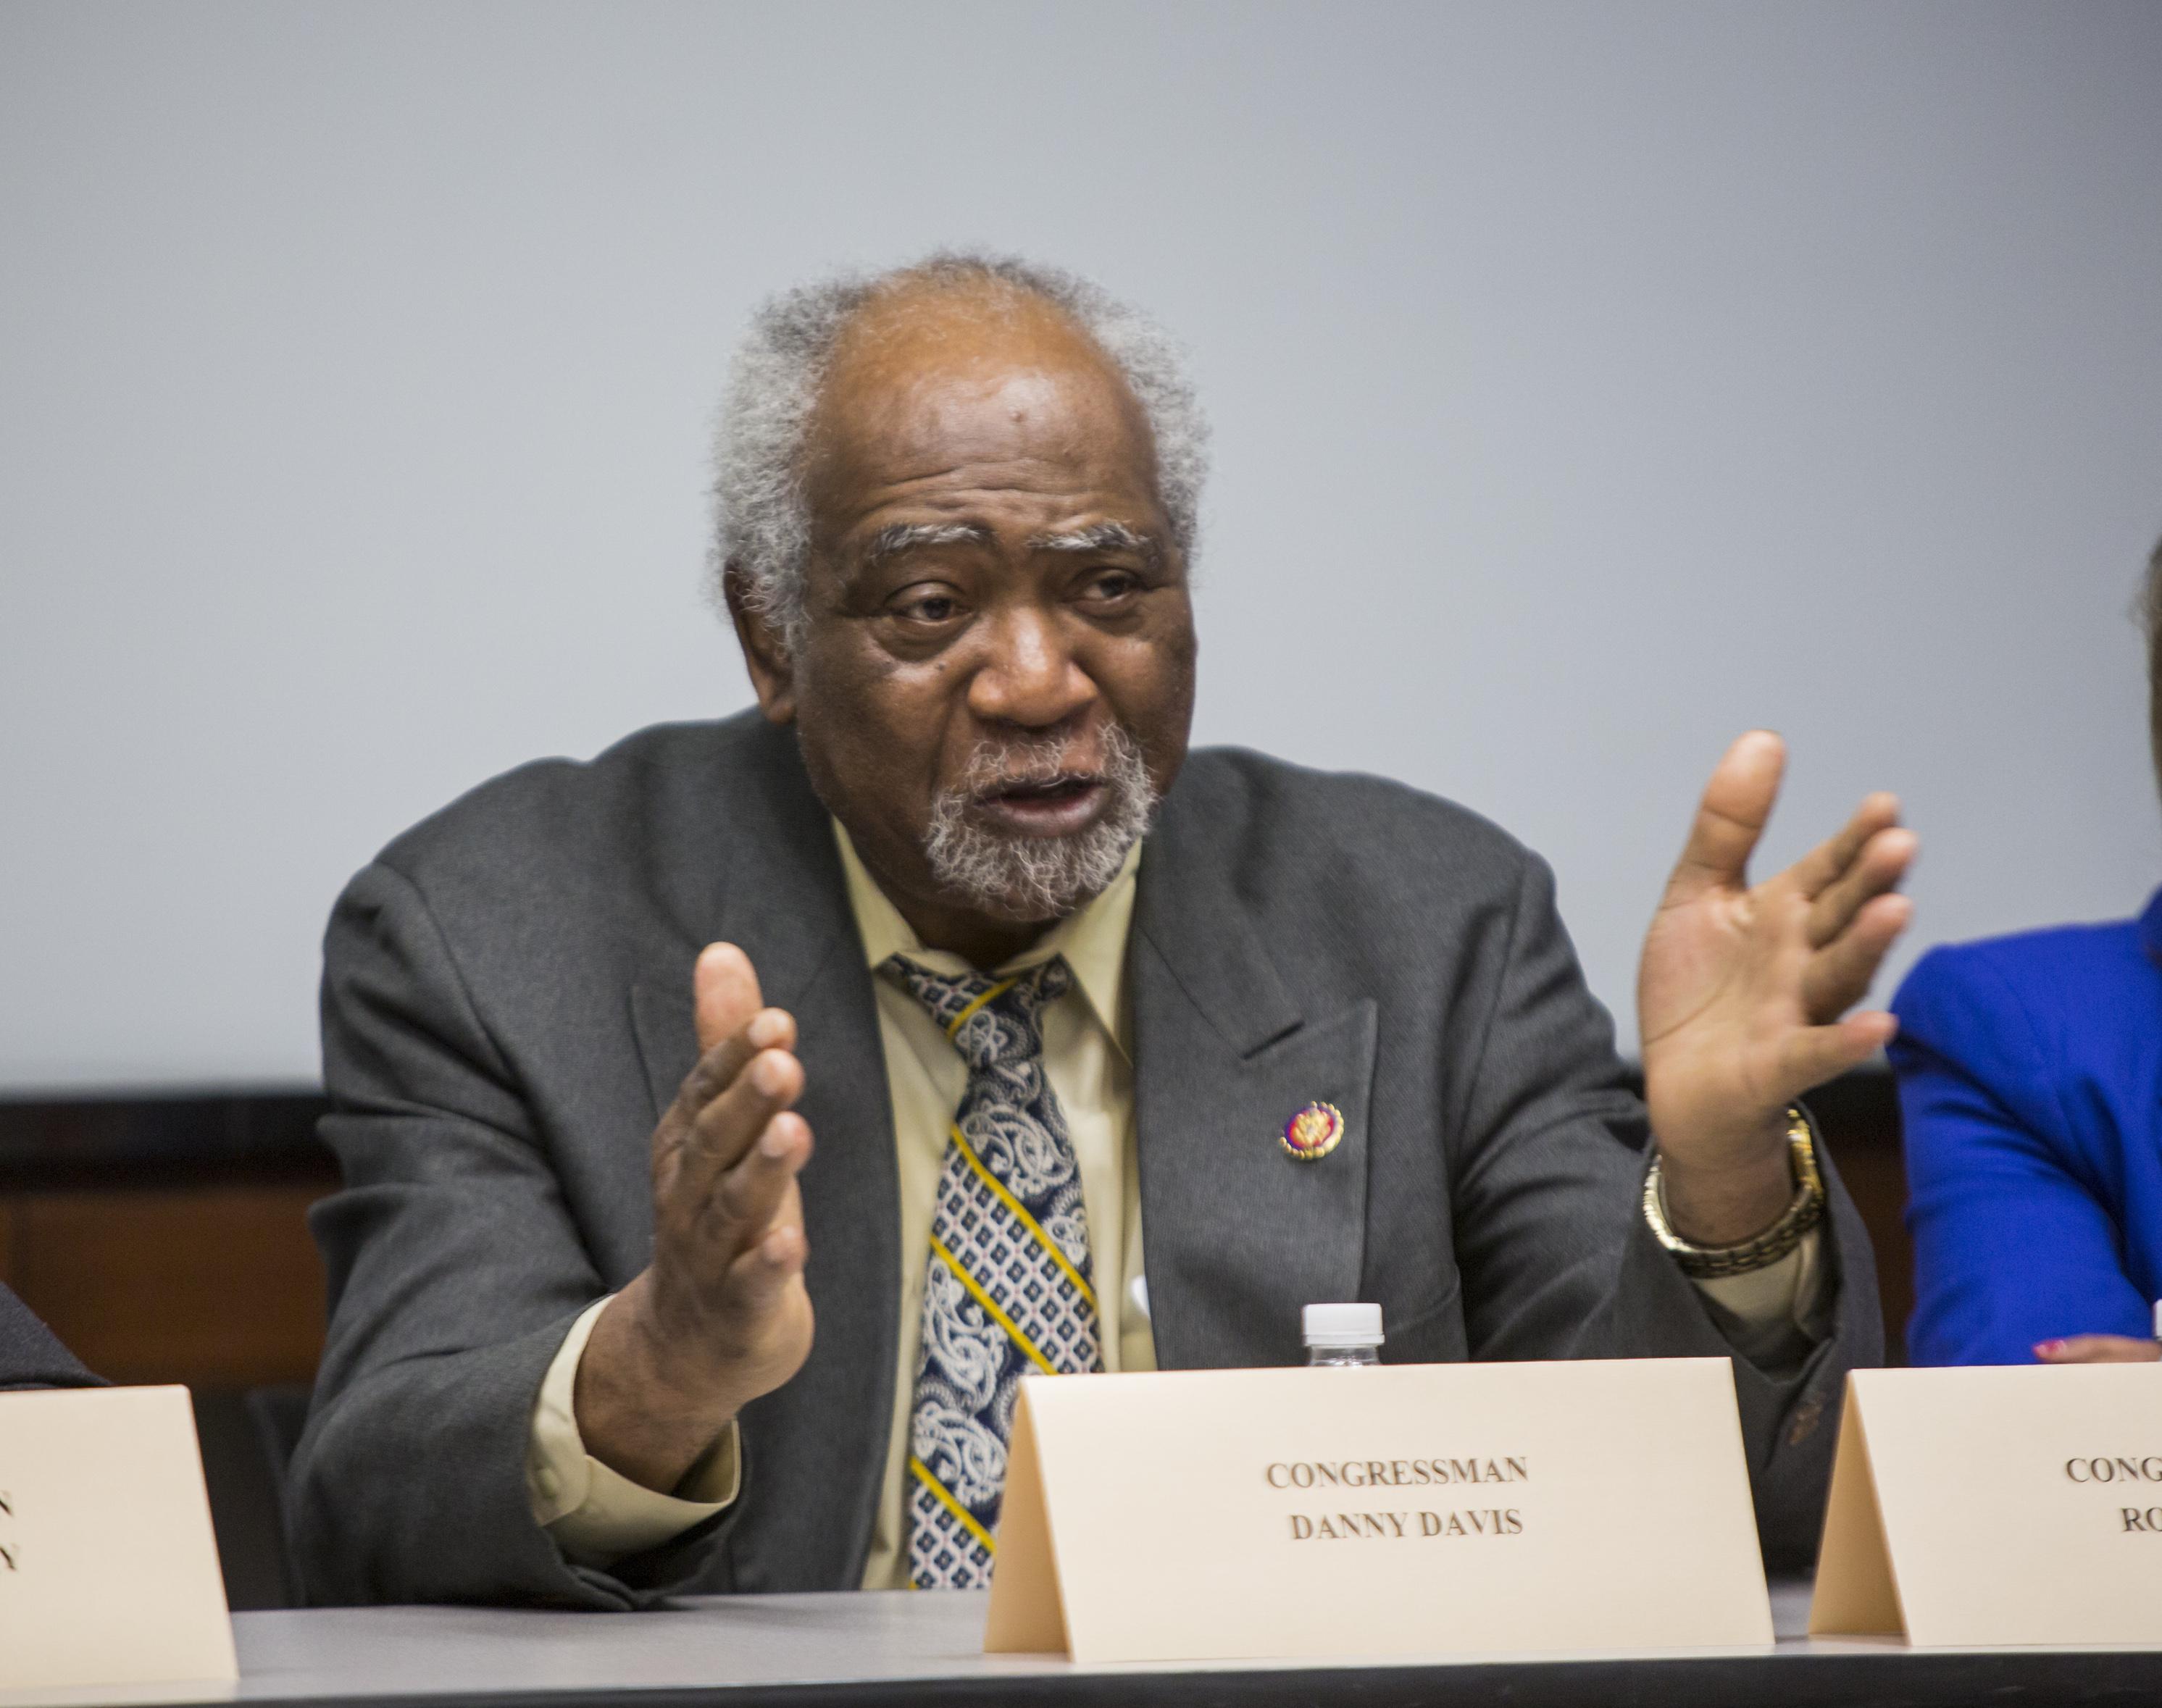 Danny K. Davis, 7th Congressional District Democratic nominee and incumbent, 2020 general election